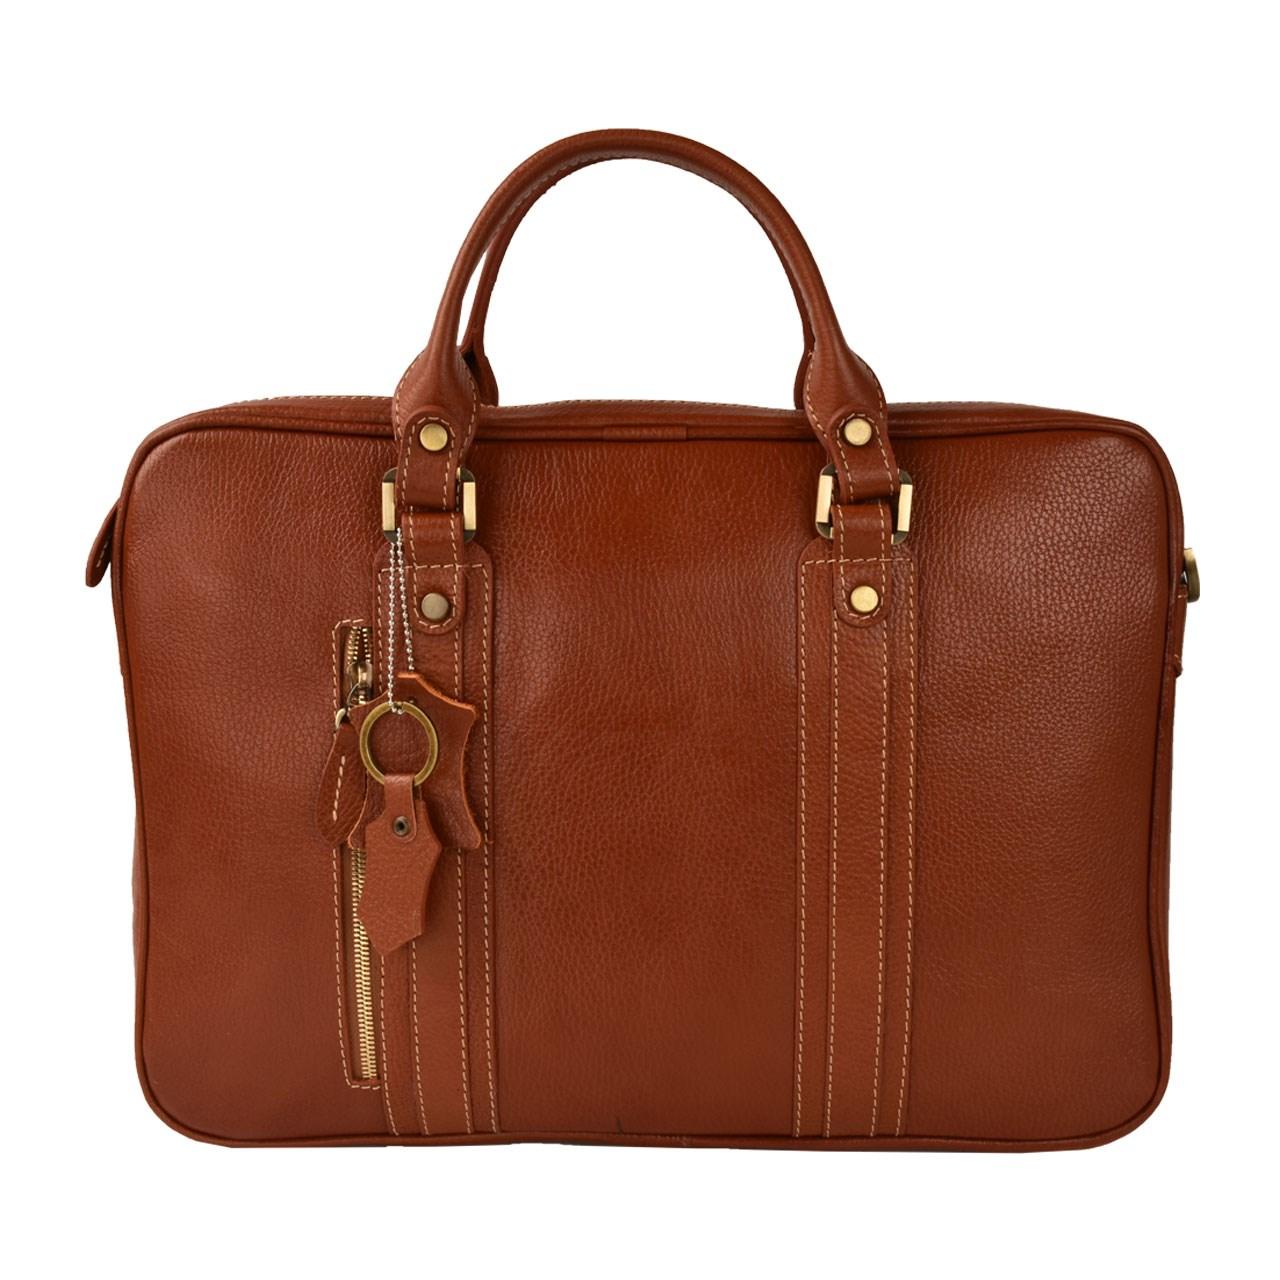 کیف اداری چرم طبیعی کهن چرم مدل L115-1